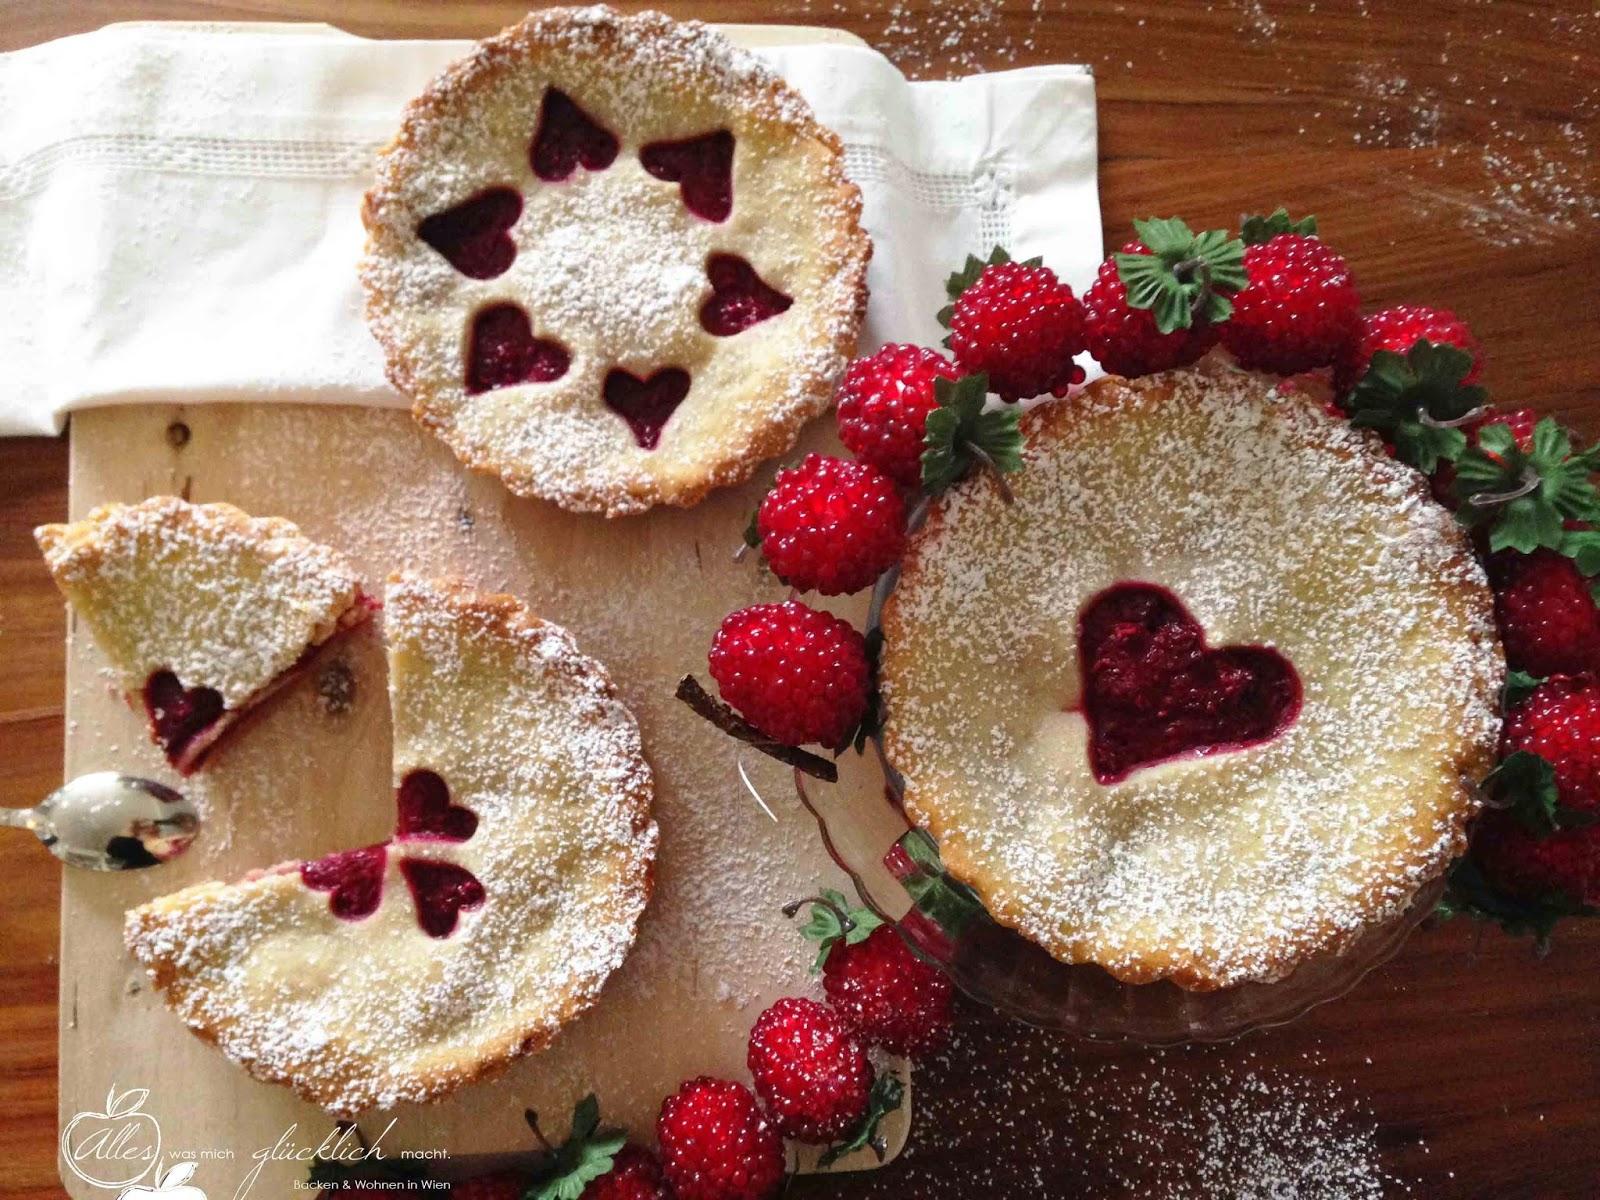 """Be my Valentine"" Kornblumen Mini-Tartlettes mit Marzipan Himbeerfüllung - vegan"